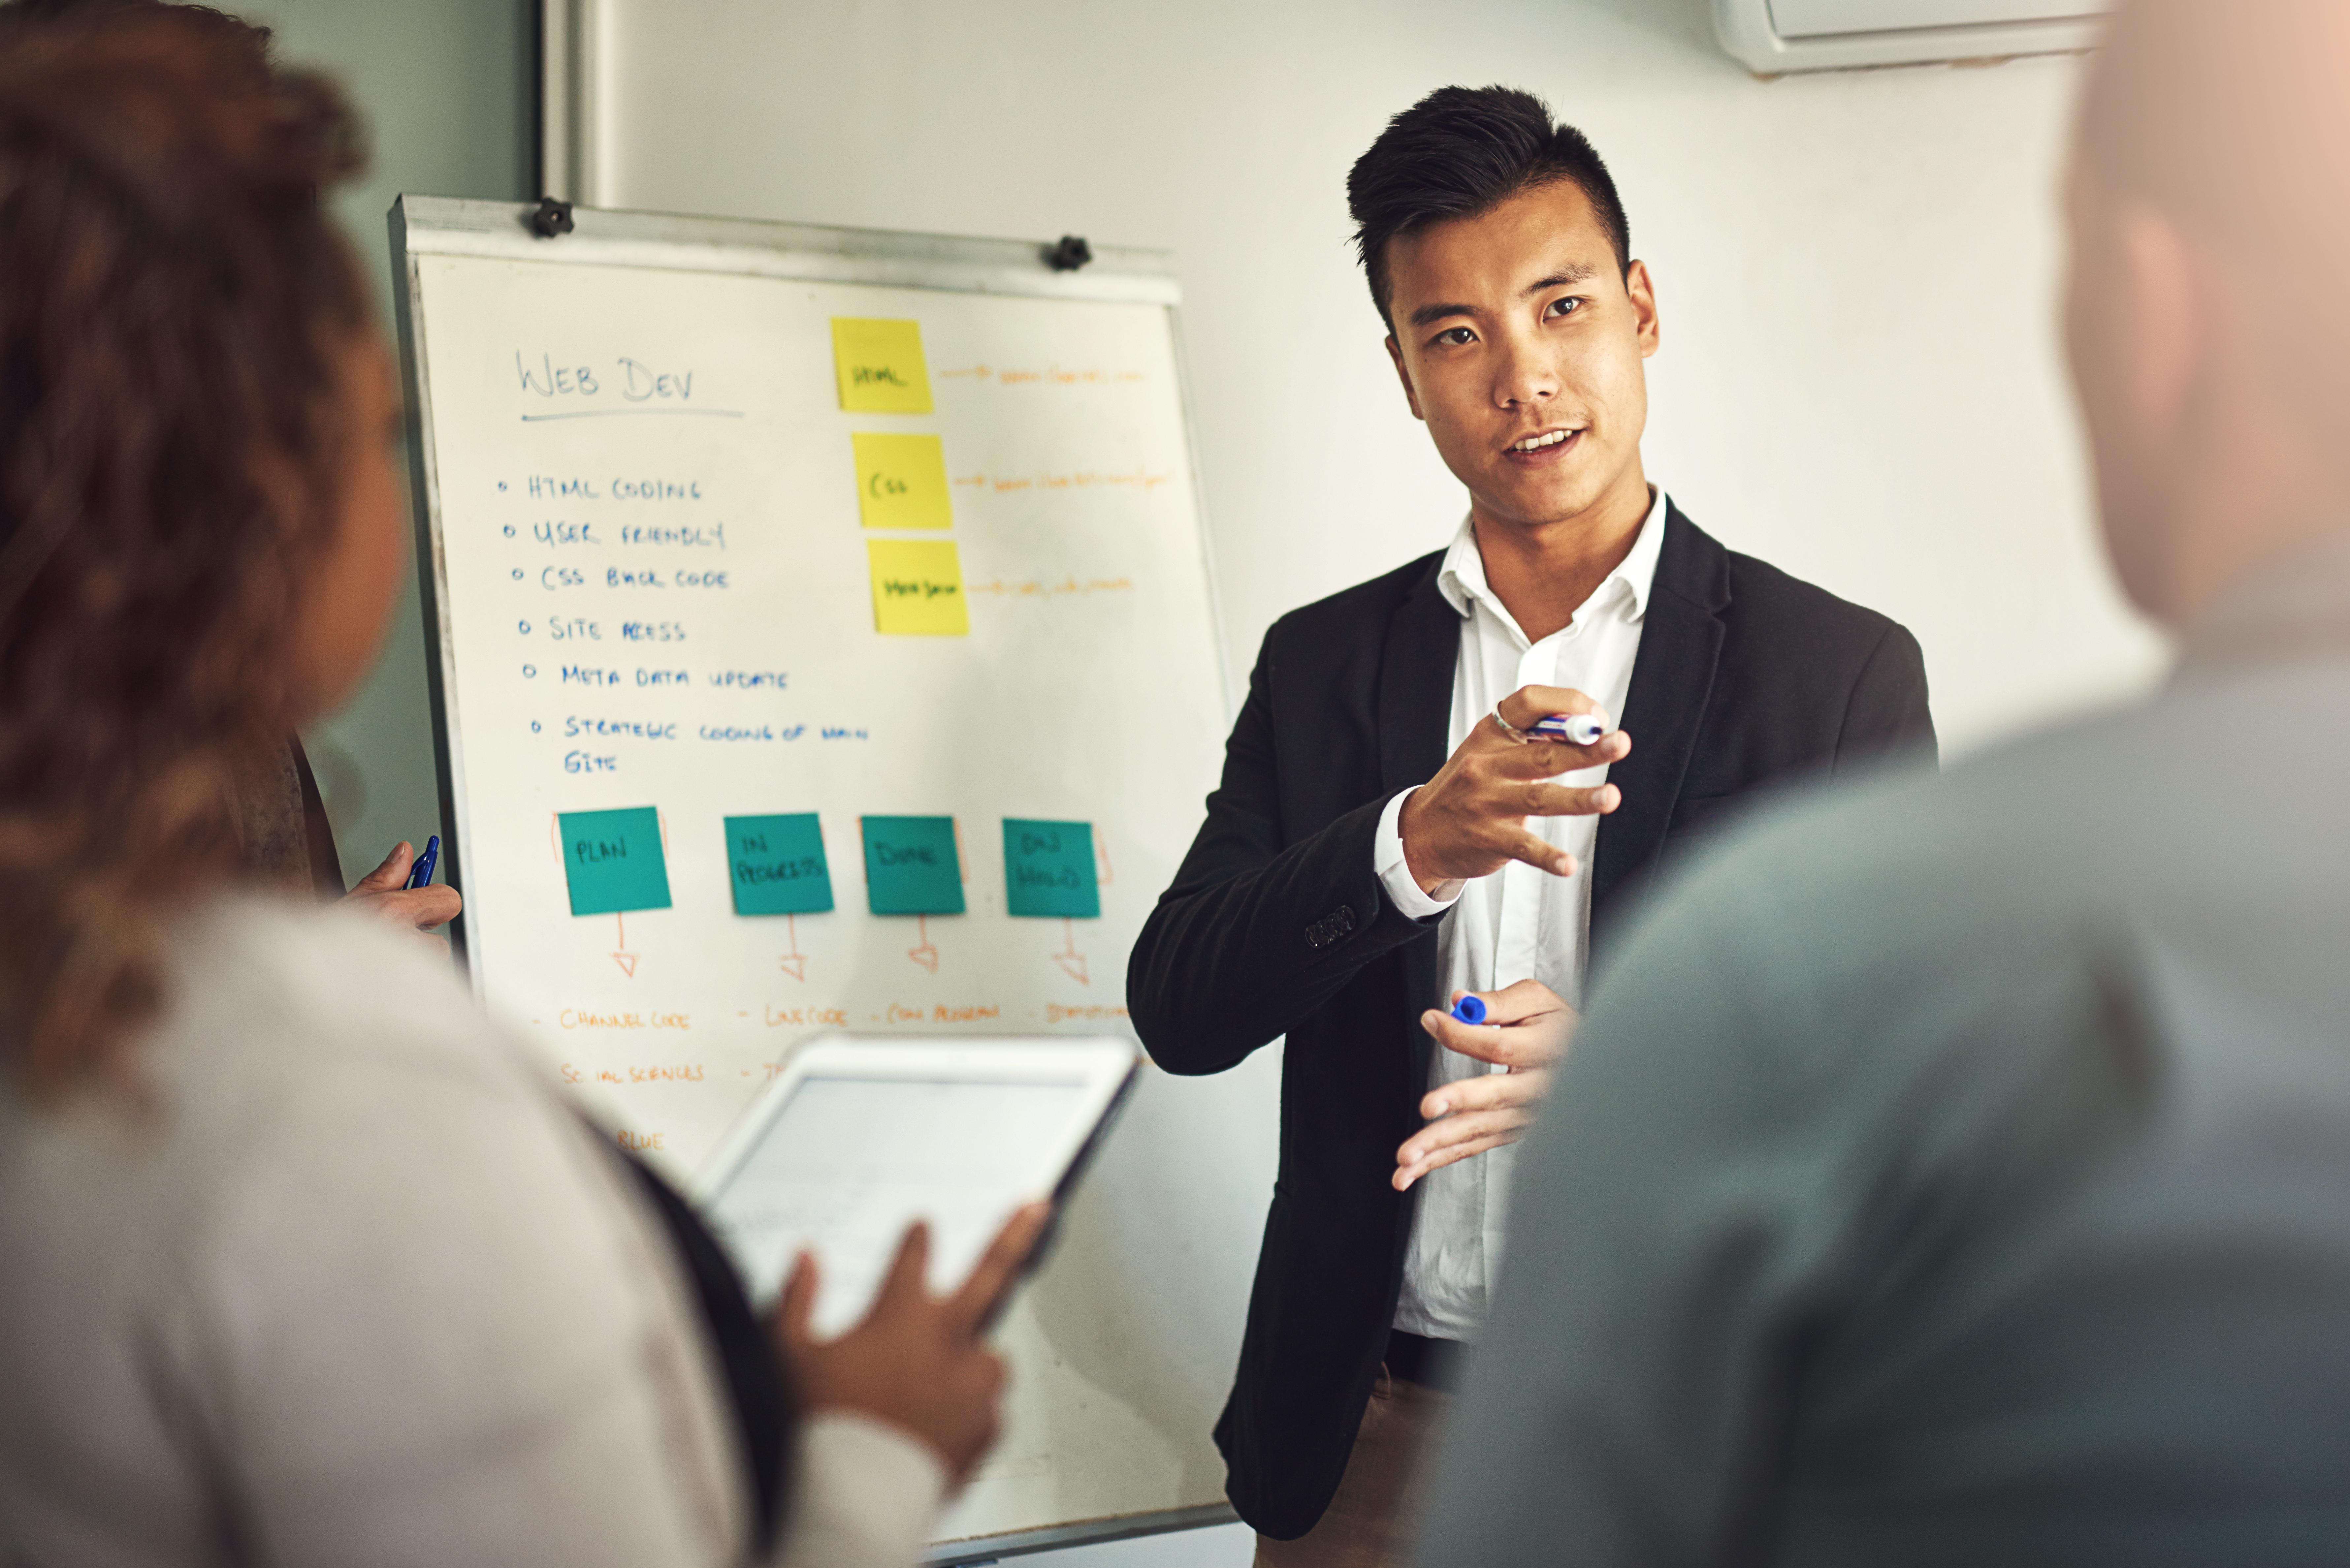 How to Make a Partnership Proposal | Chron com